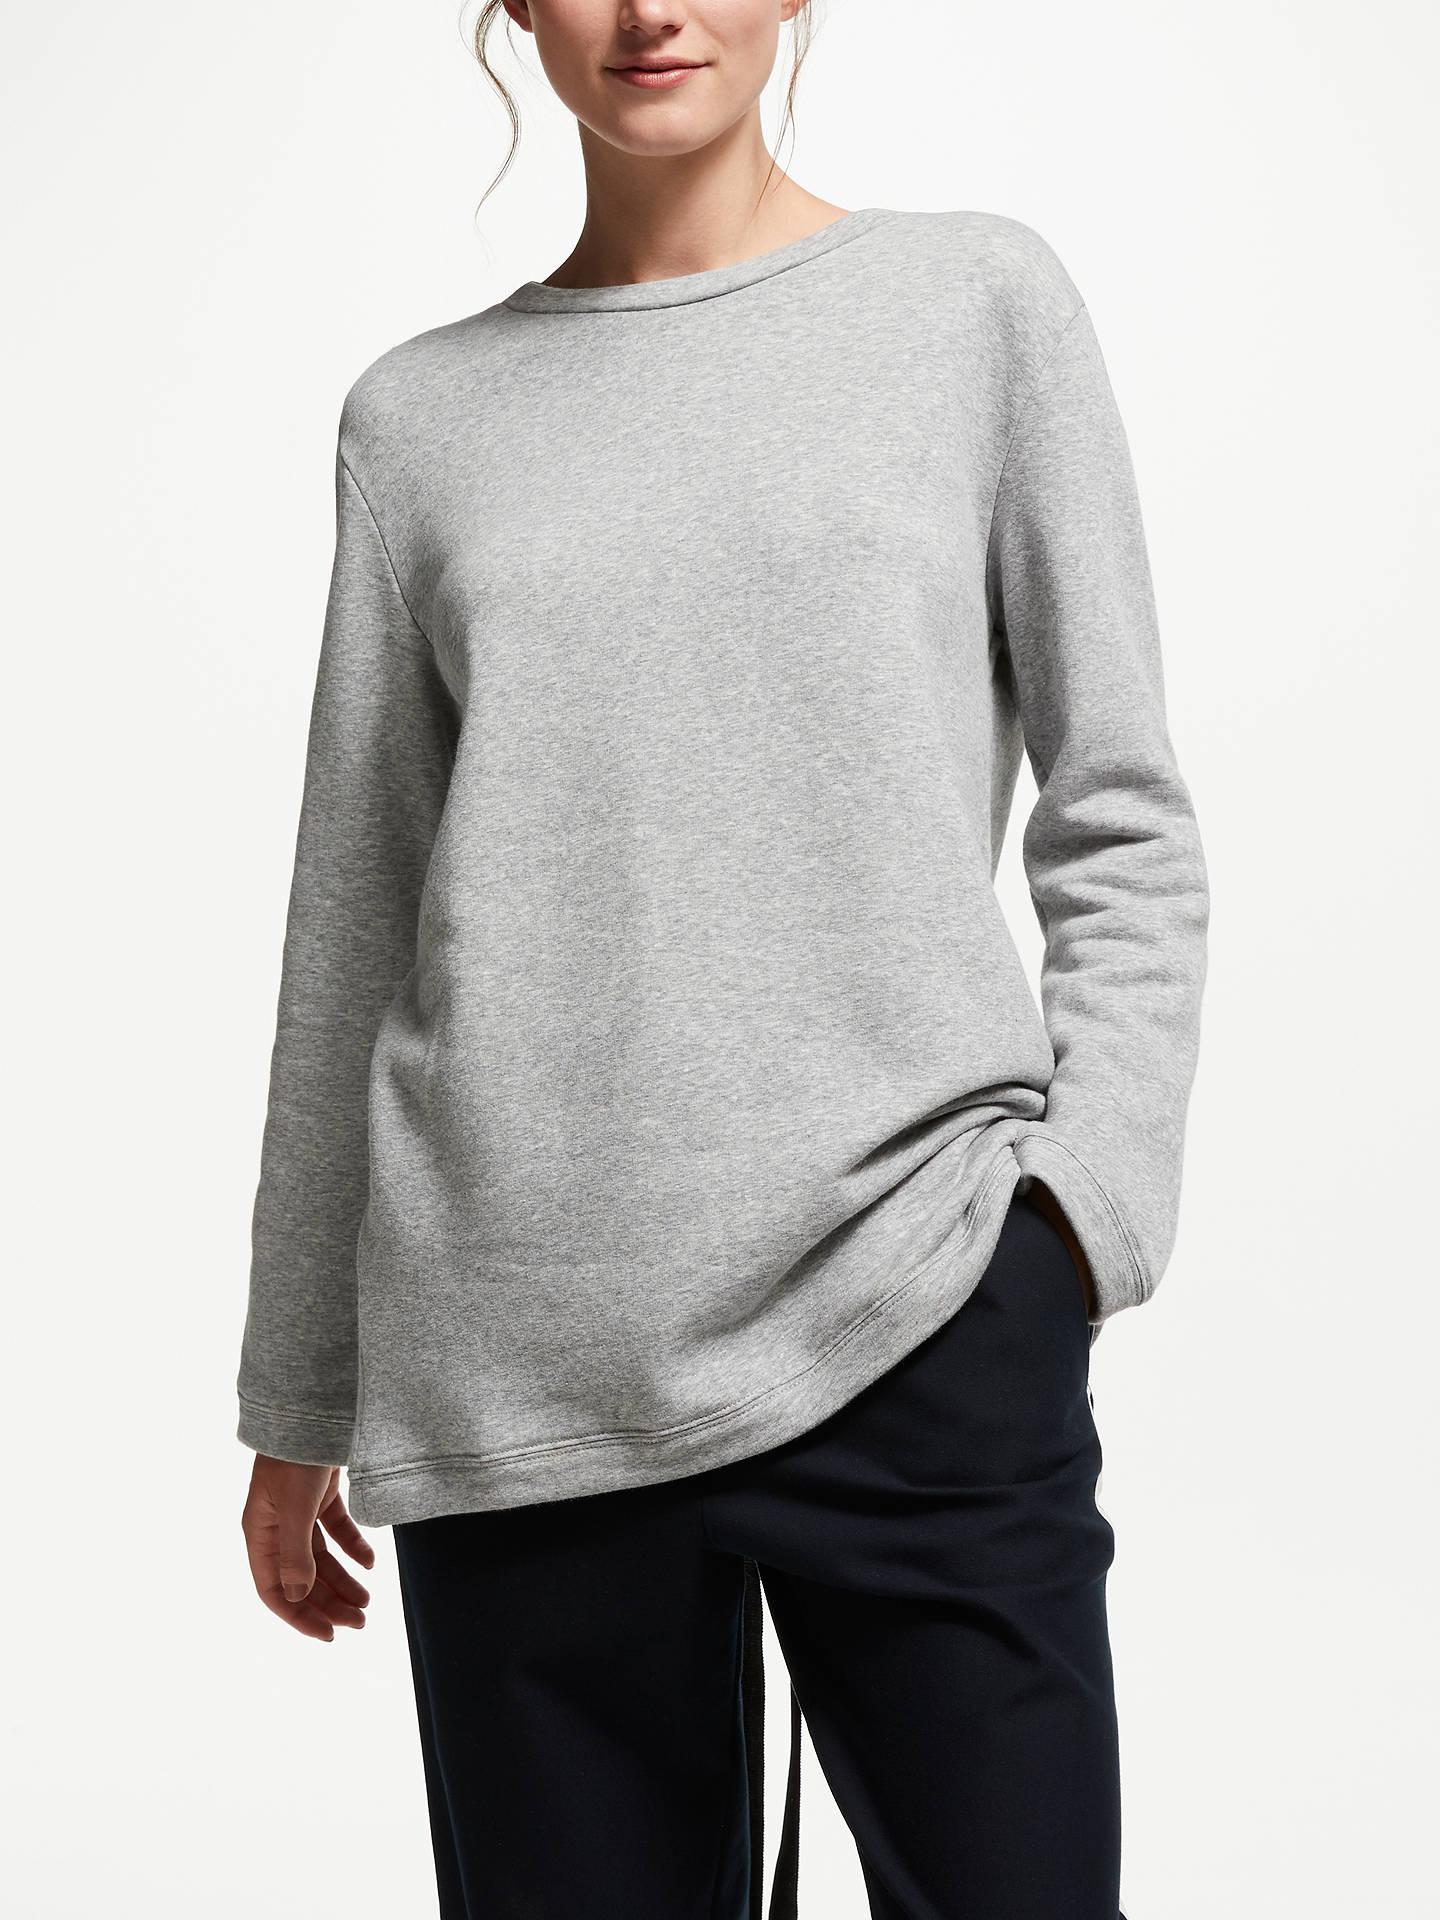 842b699602f541 Buy Finery Saffron Ribbon Tie Back Sweatshirt, Grey Marl, 16 Online at  johnlewis.